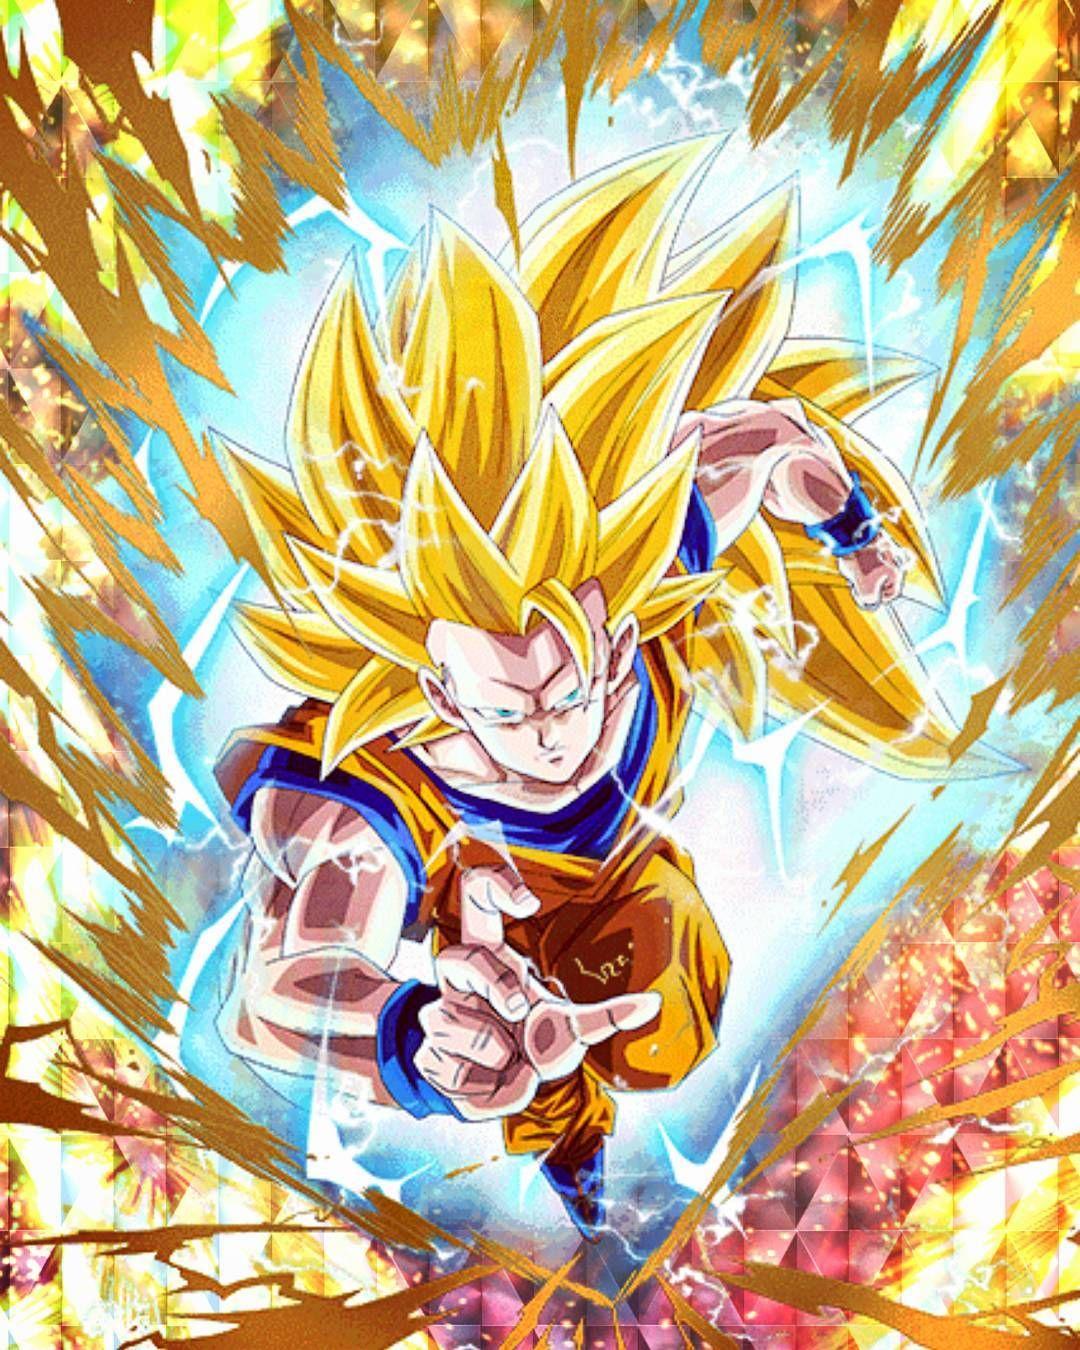 Goku Ssj3 Ignore Tags Dbz Dbs Dragonballz Dragonballsuper Anime Man Anime Dragon Ball Super Dragon Ball Wallpapers Dragon Ball Artwork